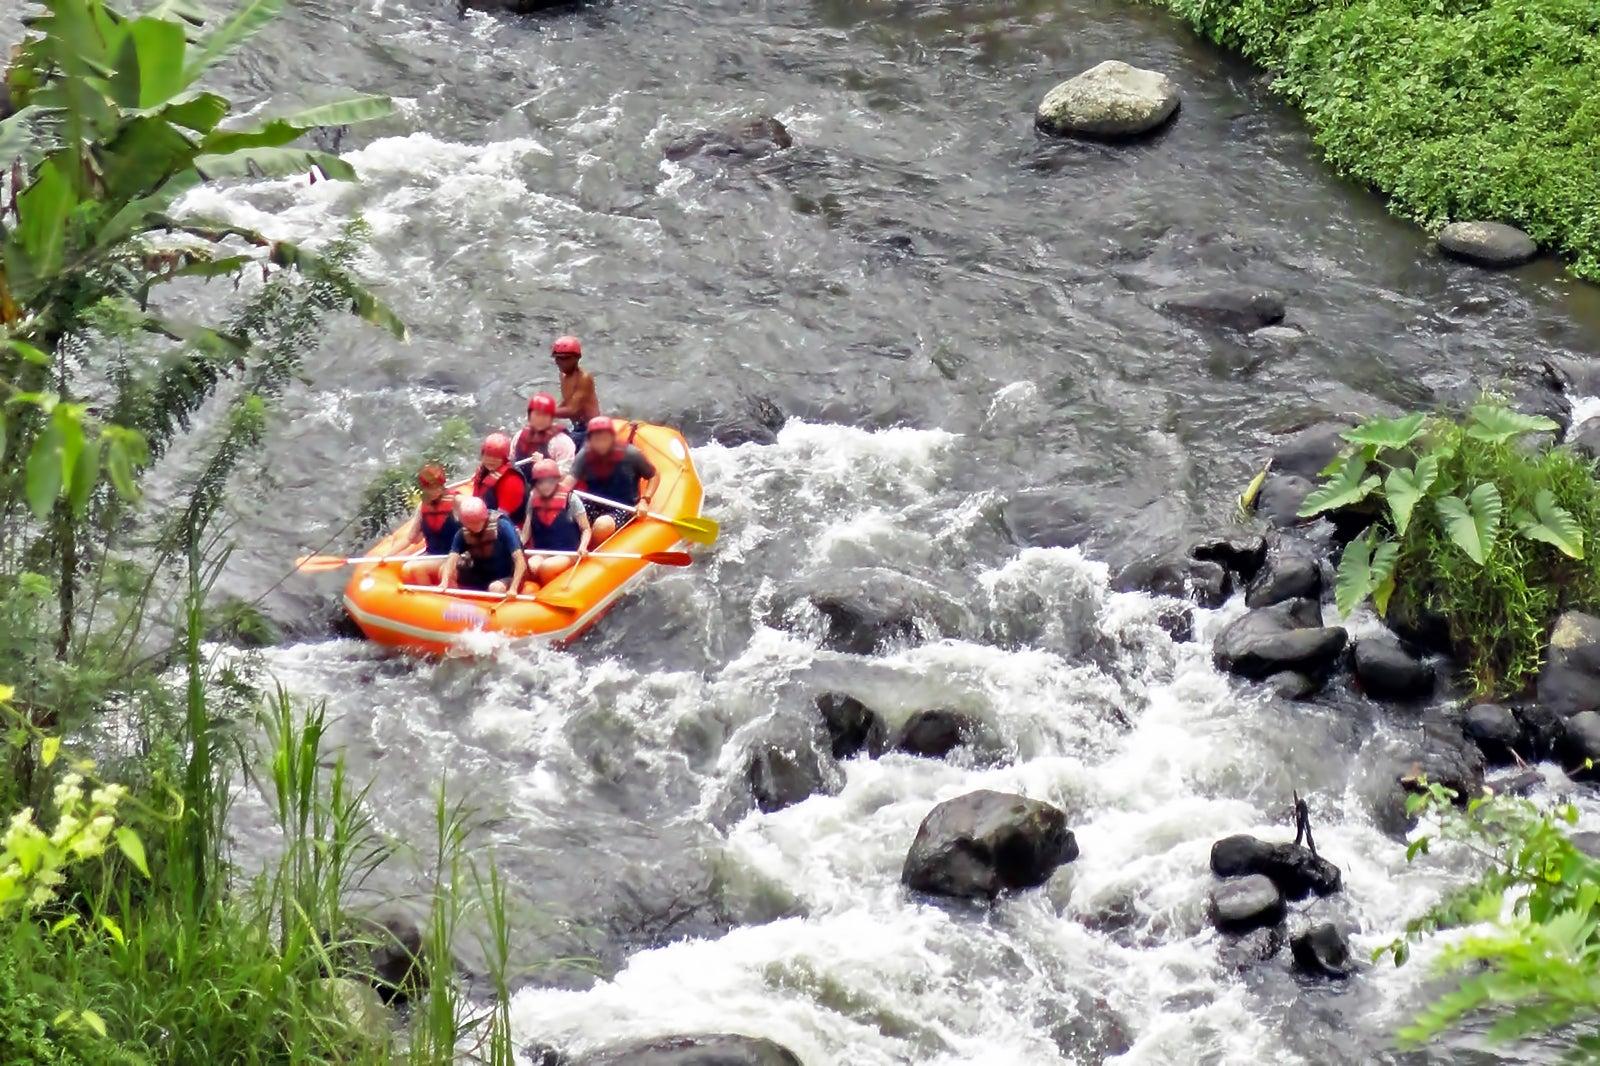 Ayung River Rafting In Bali Whitewater Rafting In Ubud